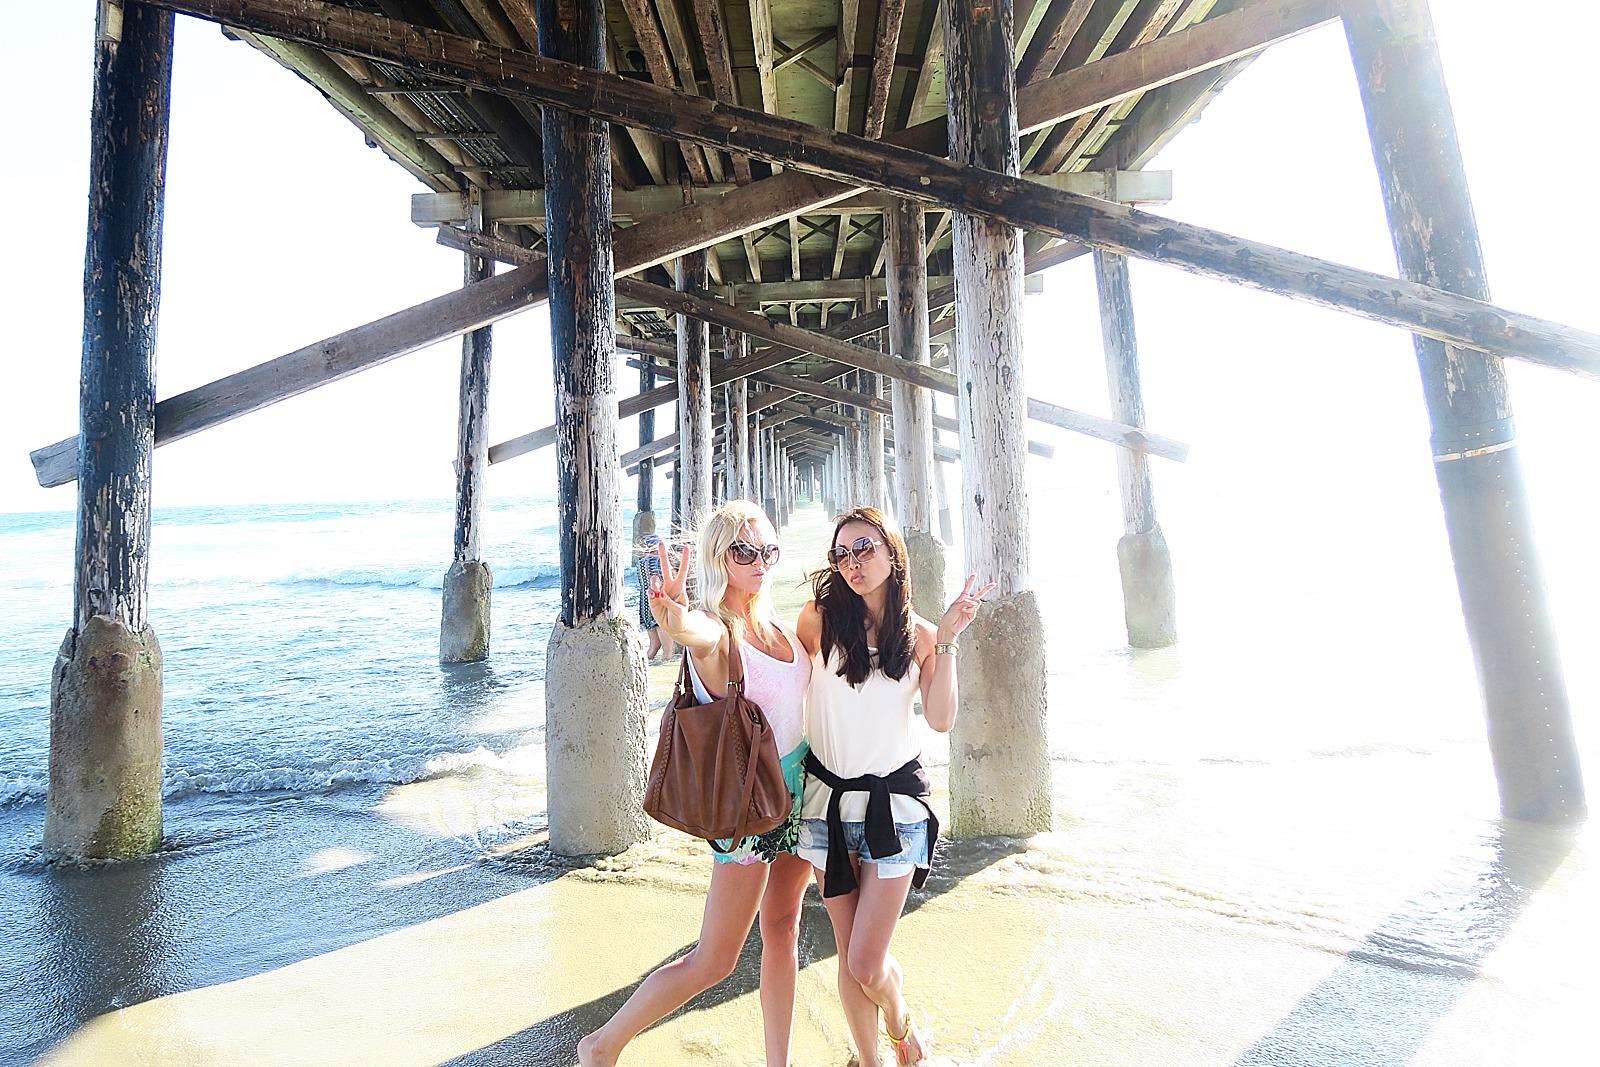 diana-elizabeth-blog-travel-fashion-blogger-phoenix-arizona-costa-mesa-california-beach_0007